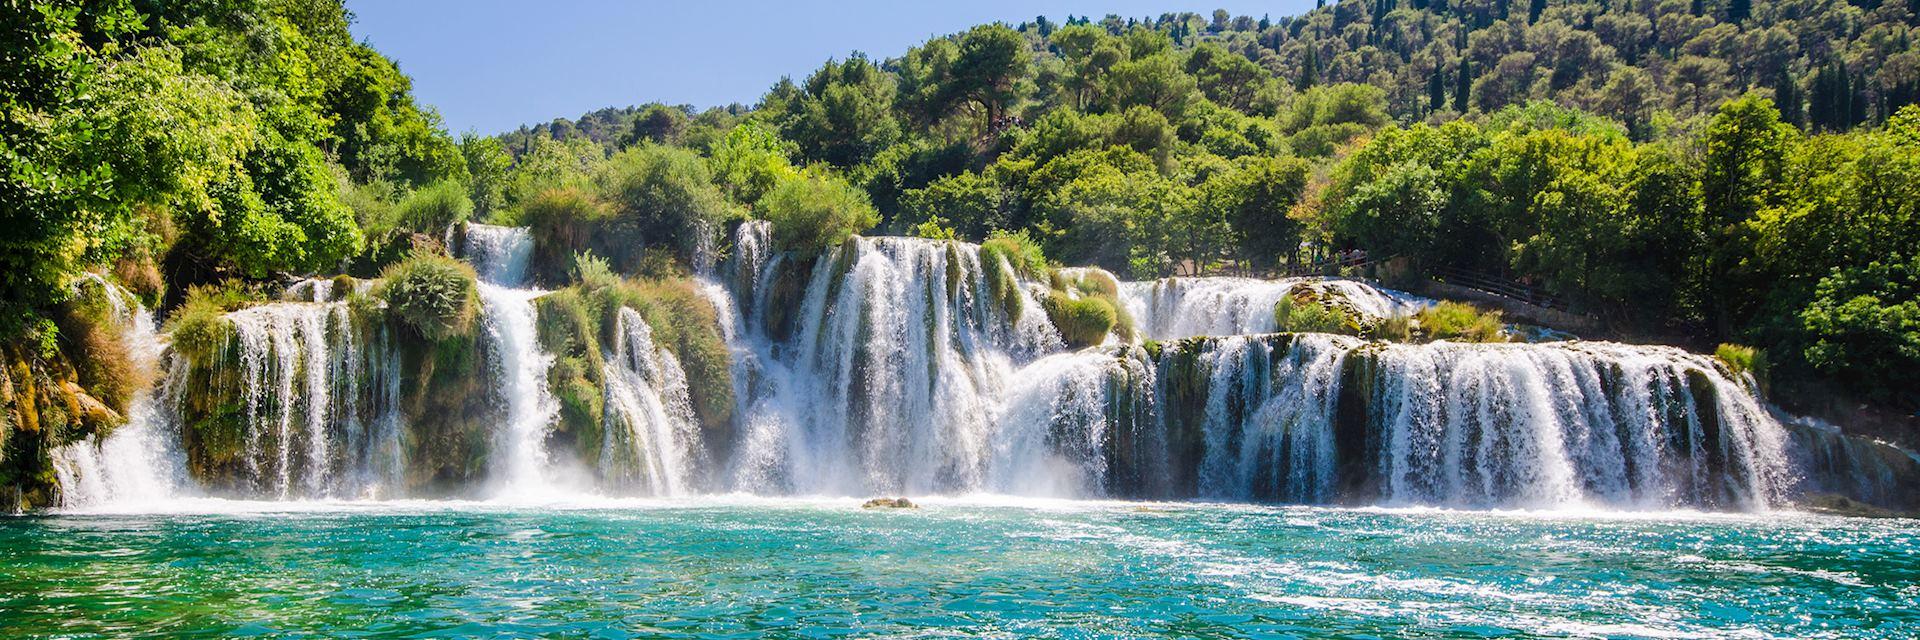 Krka river waterfalls, Dalmatia